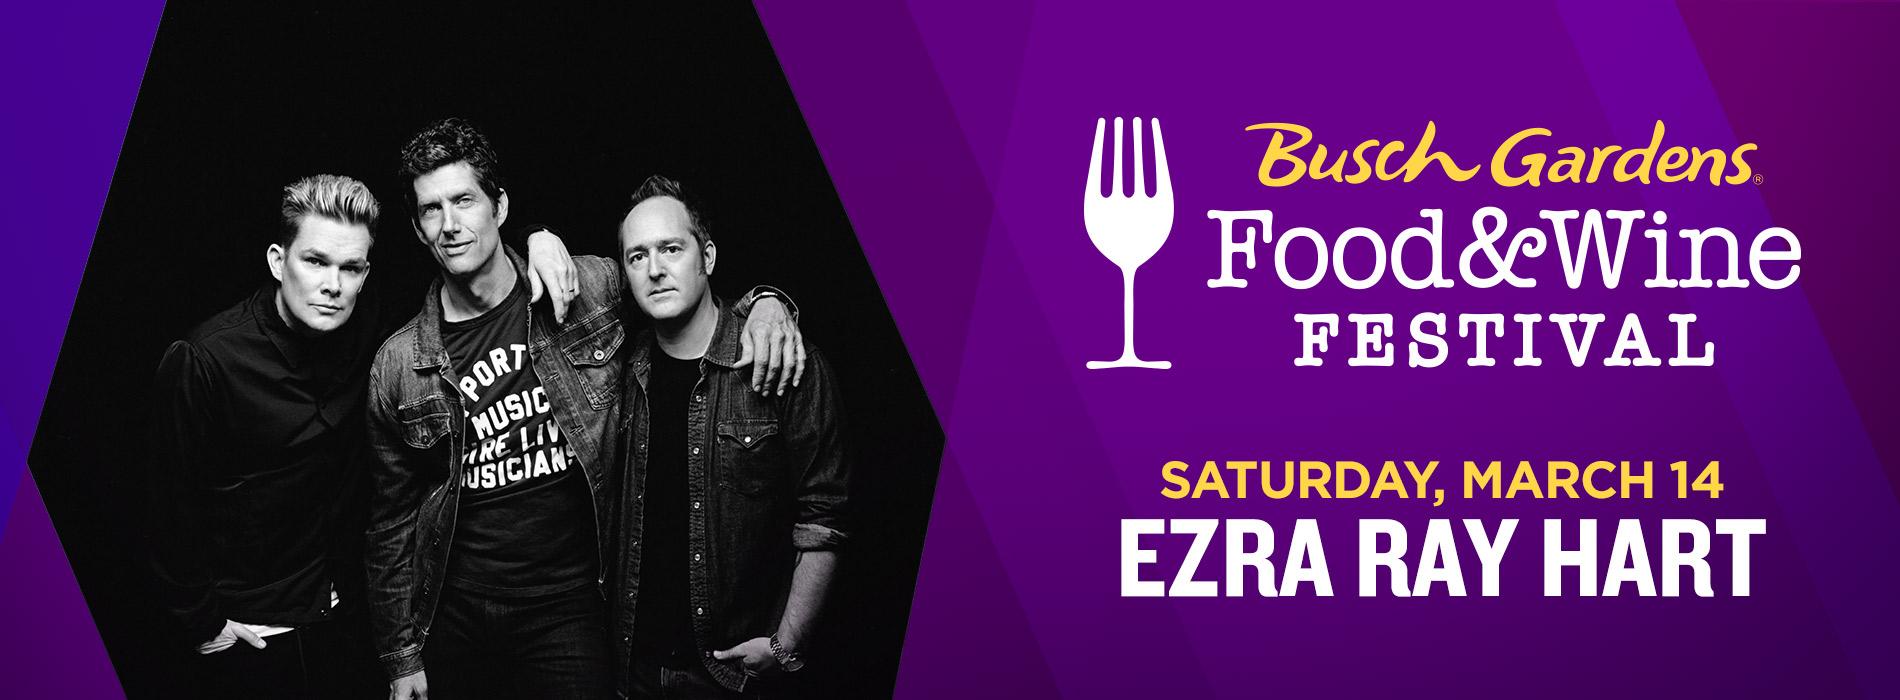 Ezra Ray Hart at Busch Gardens on Saturday, March 14